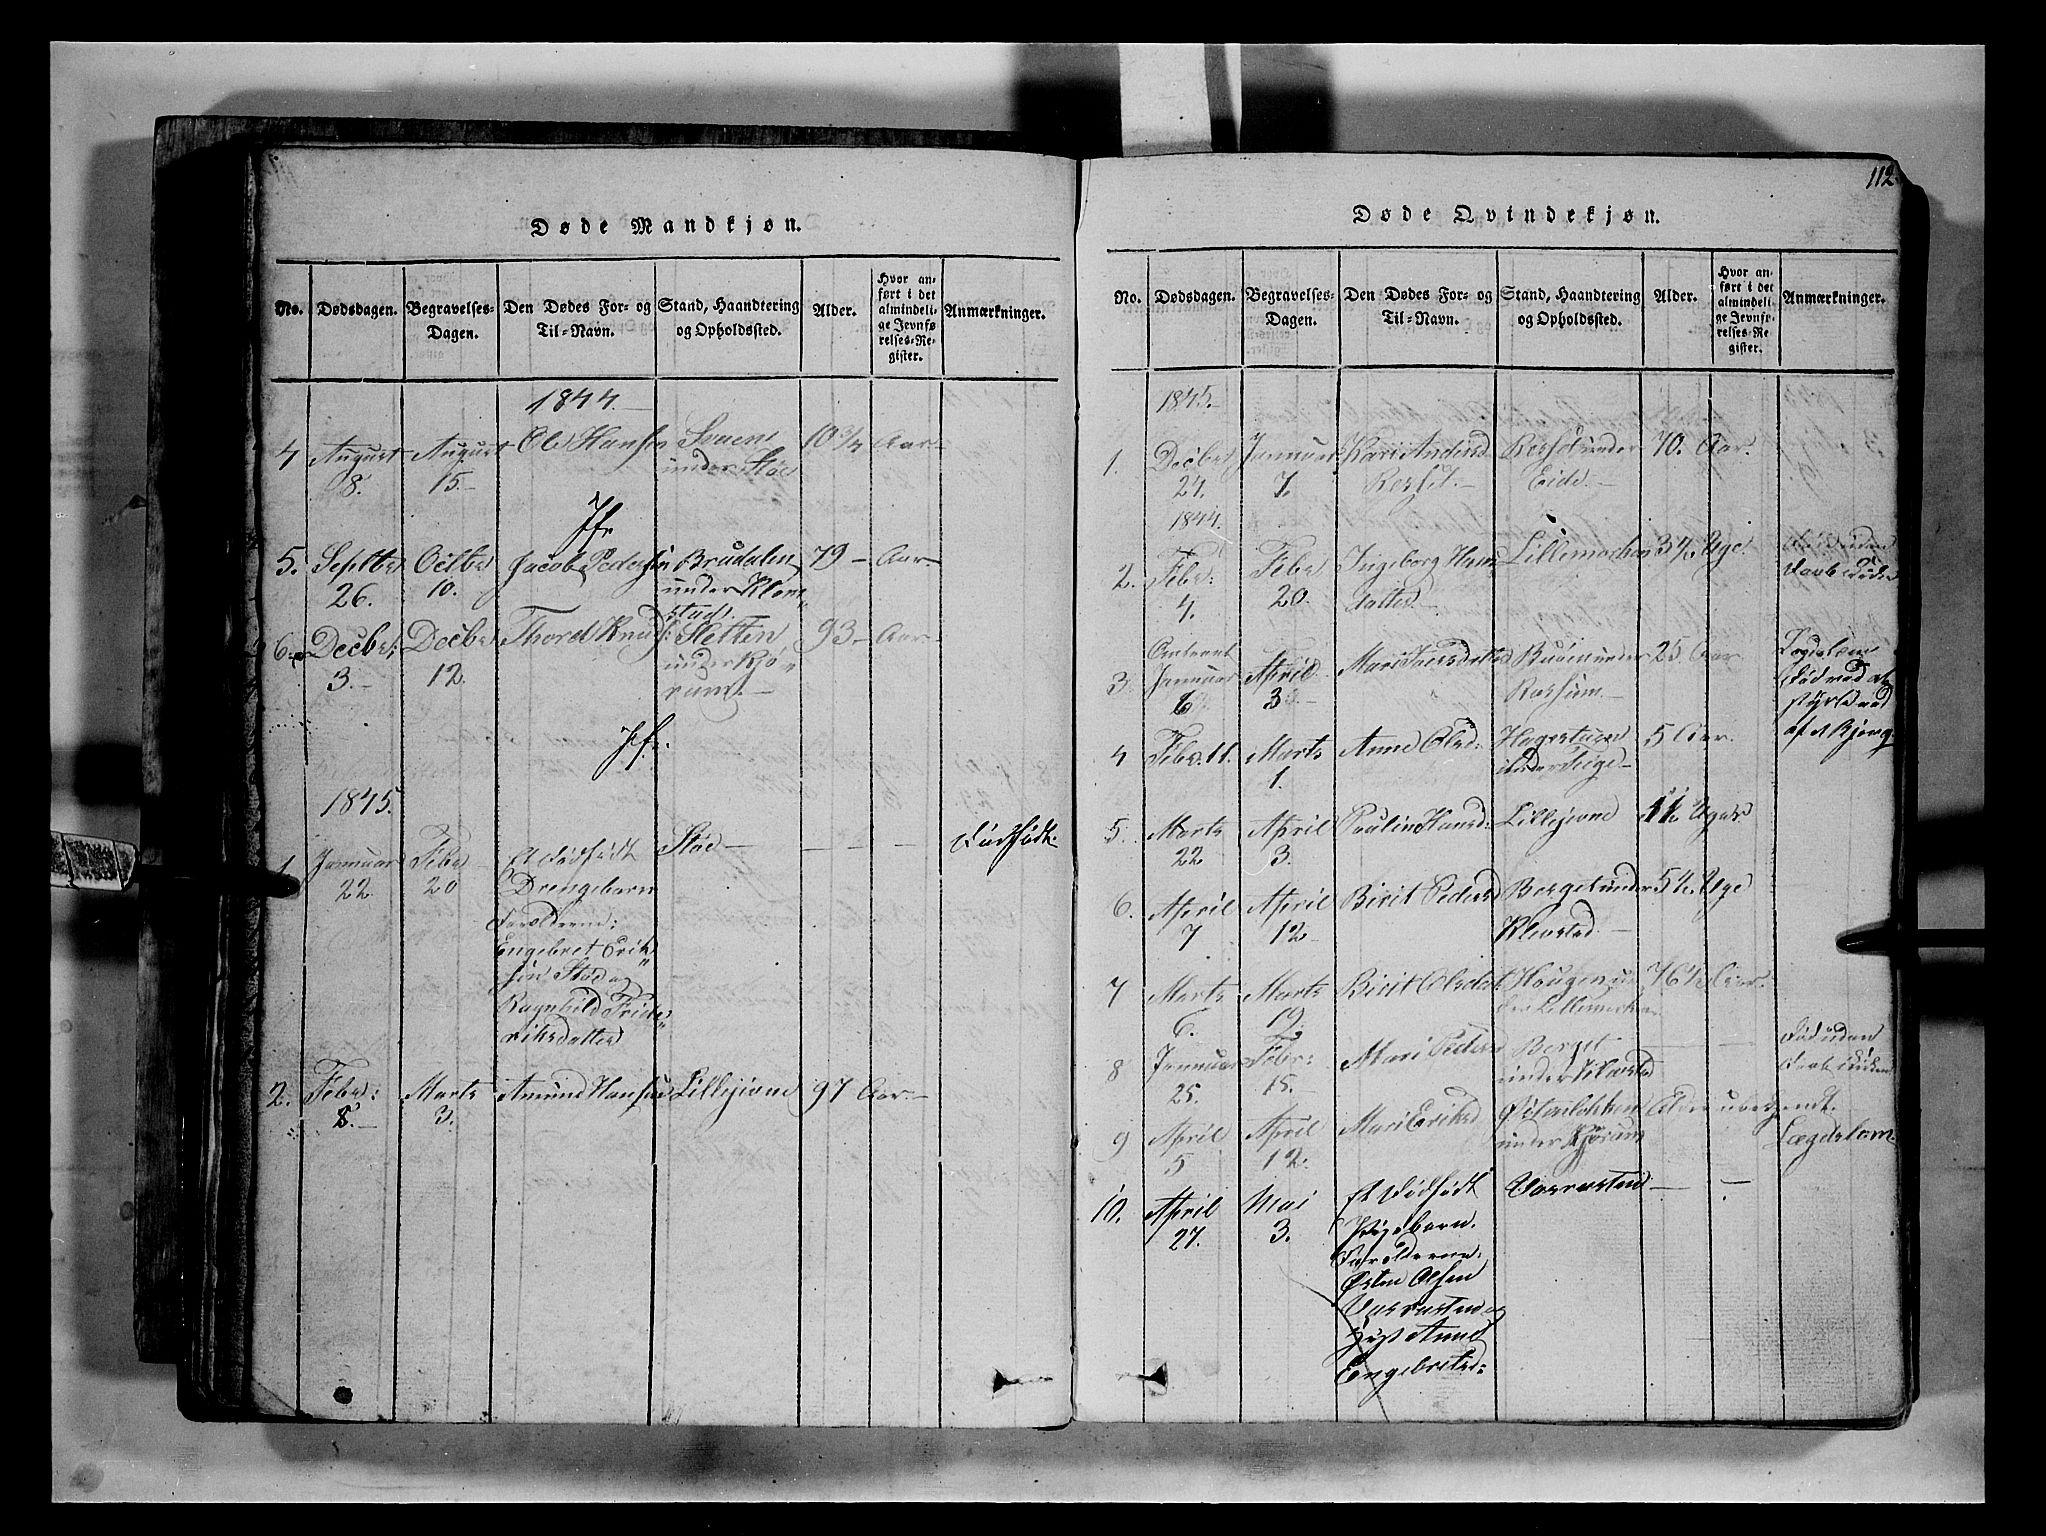 SAH, Fron prestekontor, H/Ha/Hab/L0002: Klokkerbok nr. 2, 1816-1850, s. 112